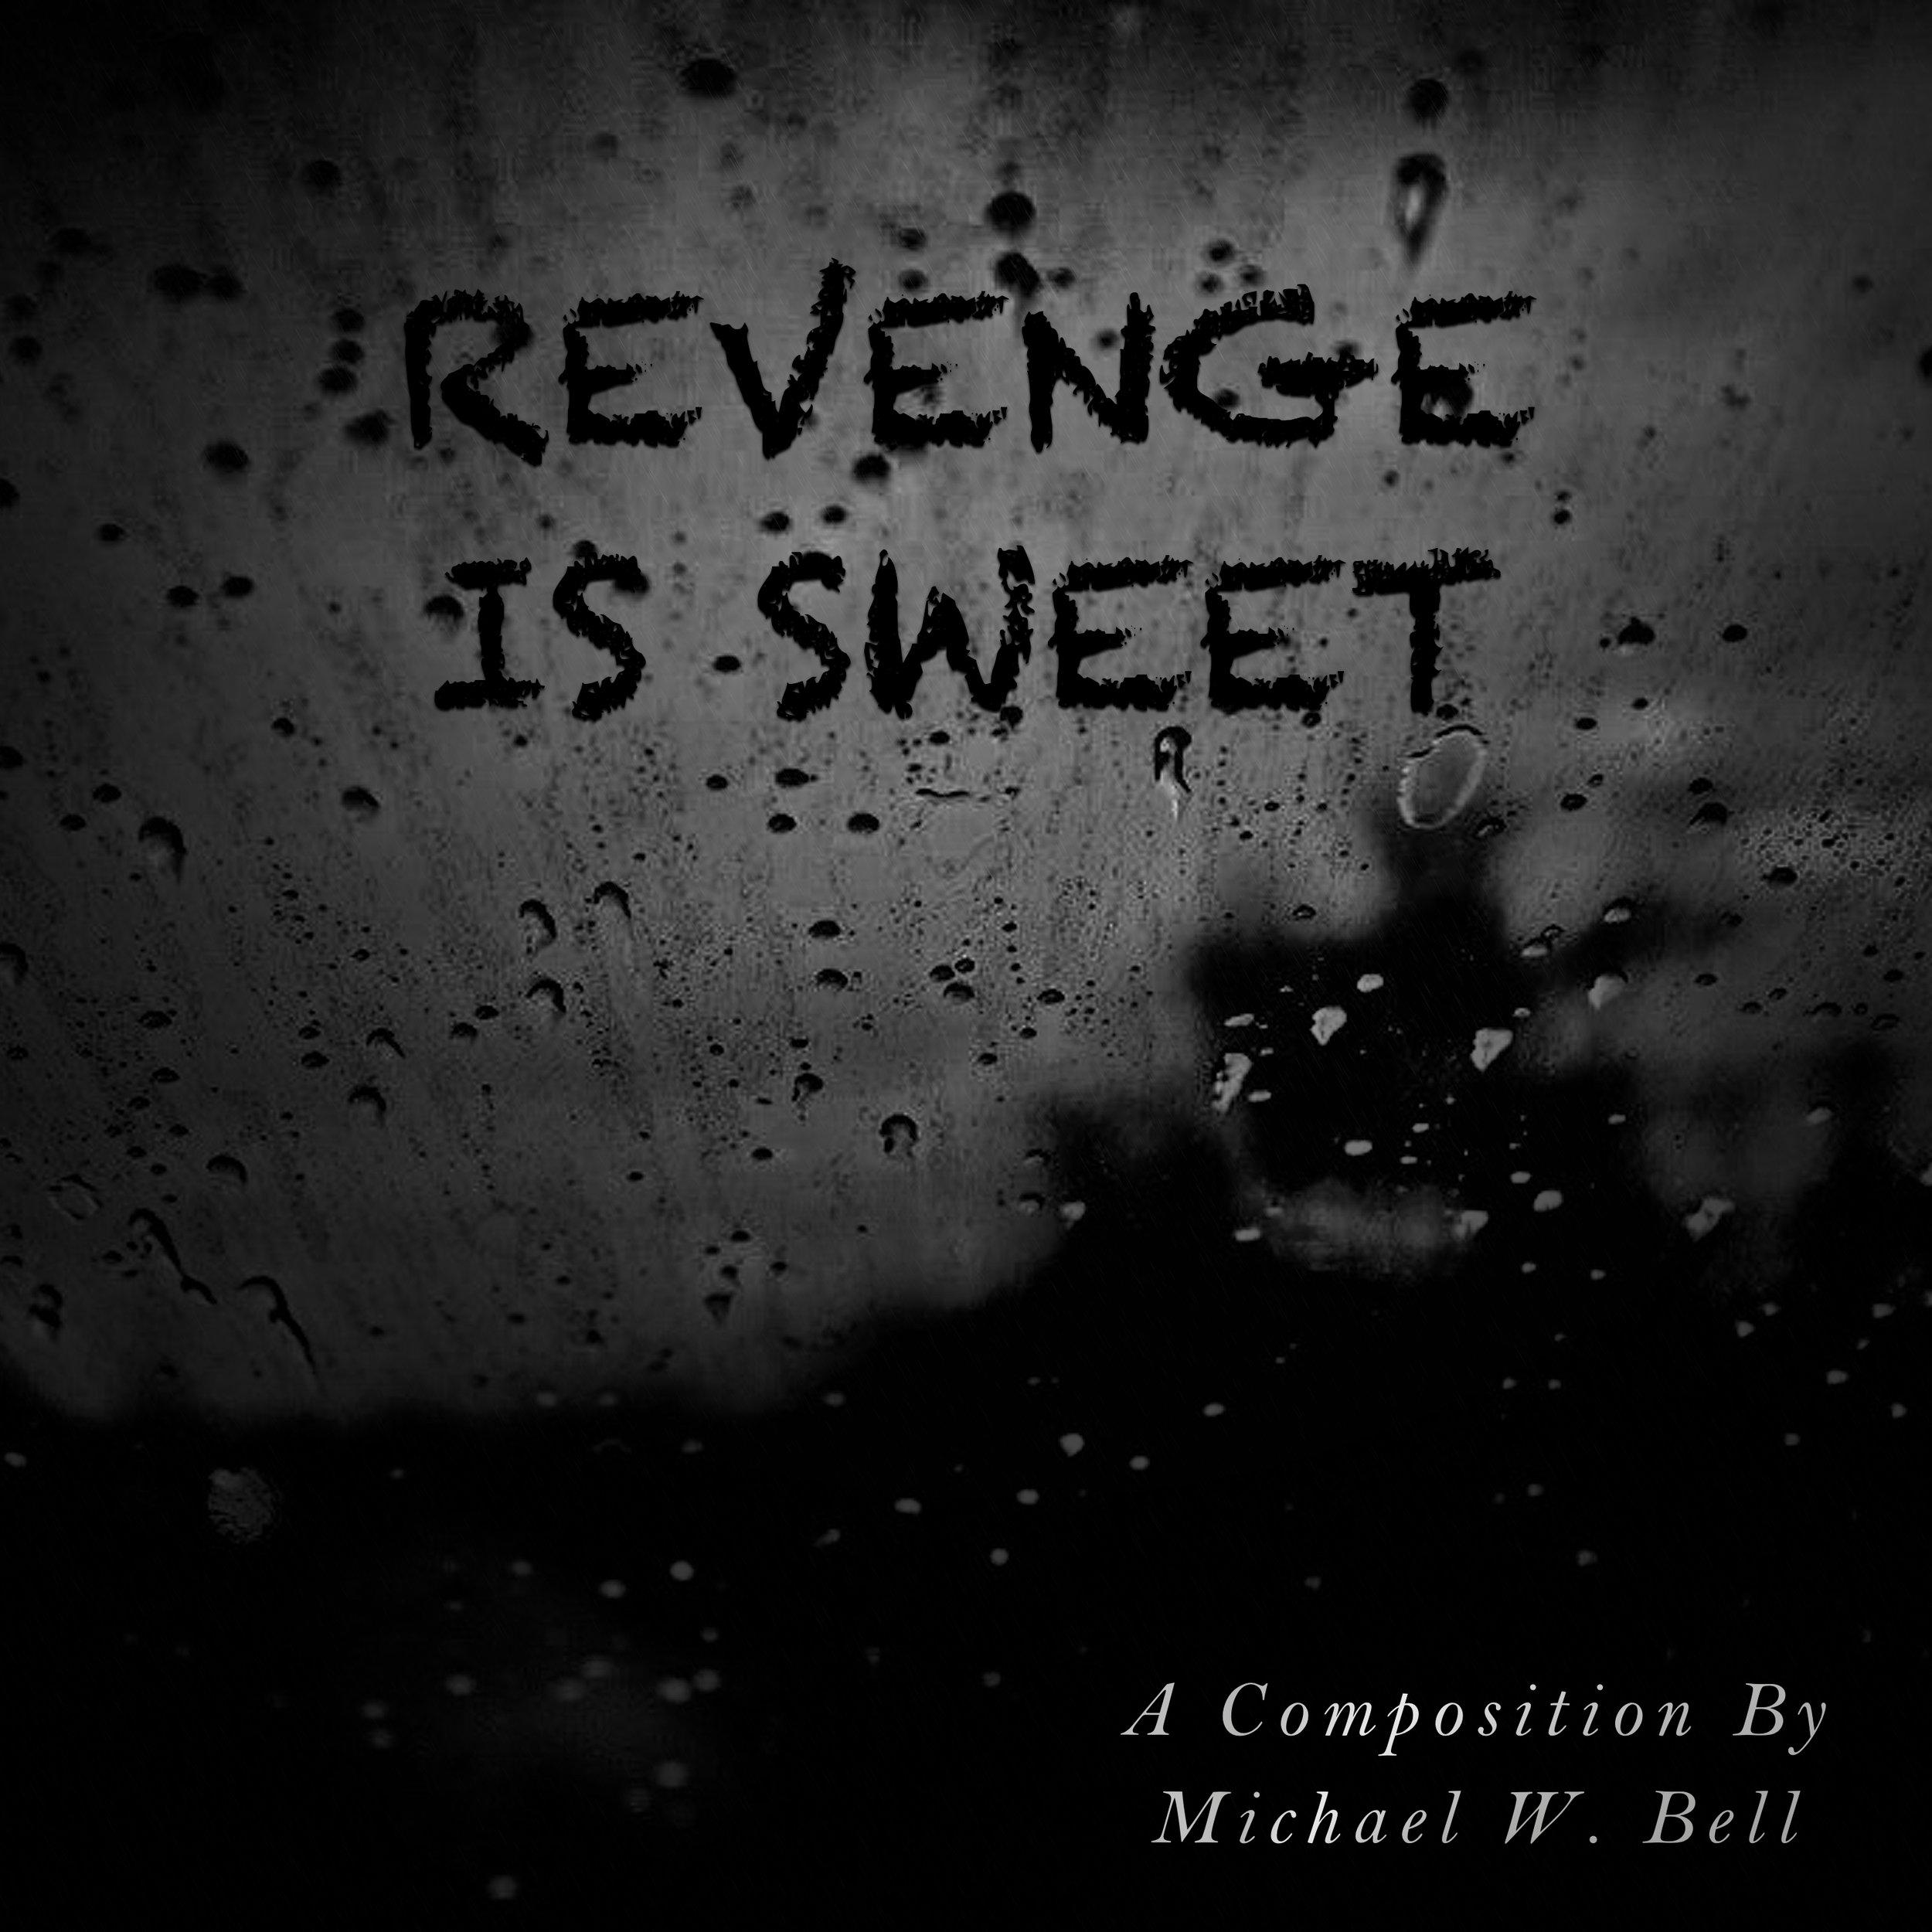 MICHAEL W. BELLRevenge is Sweet - AEP0012 - SingleGenre: Film ScoreReleased: 04.07.2019